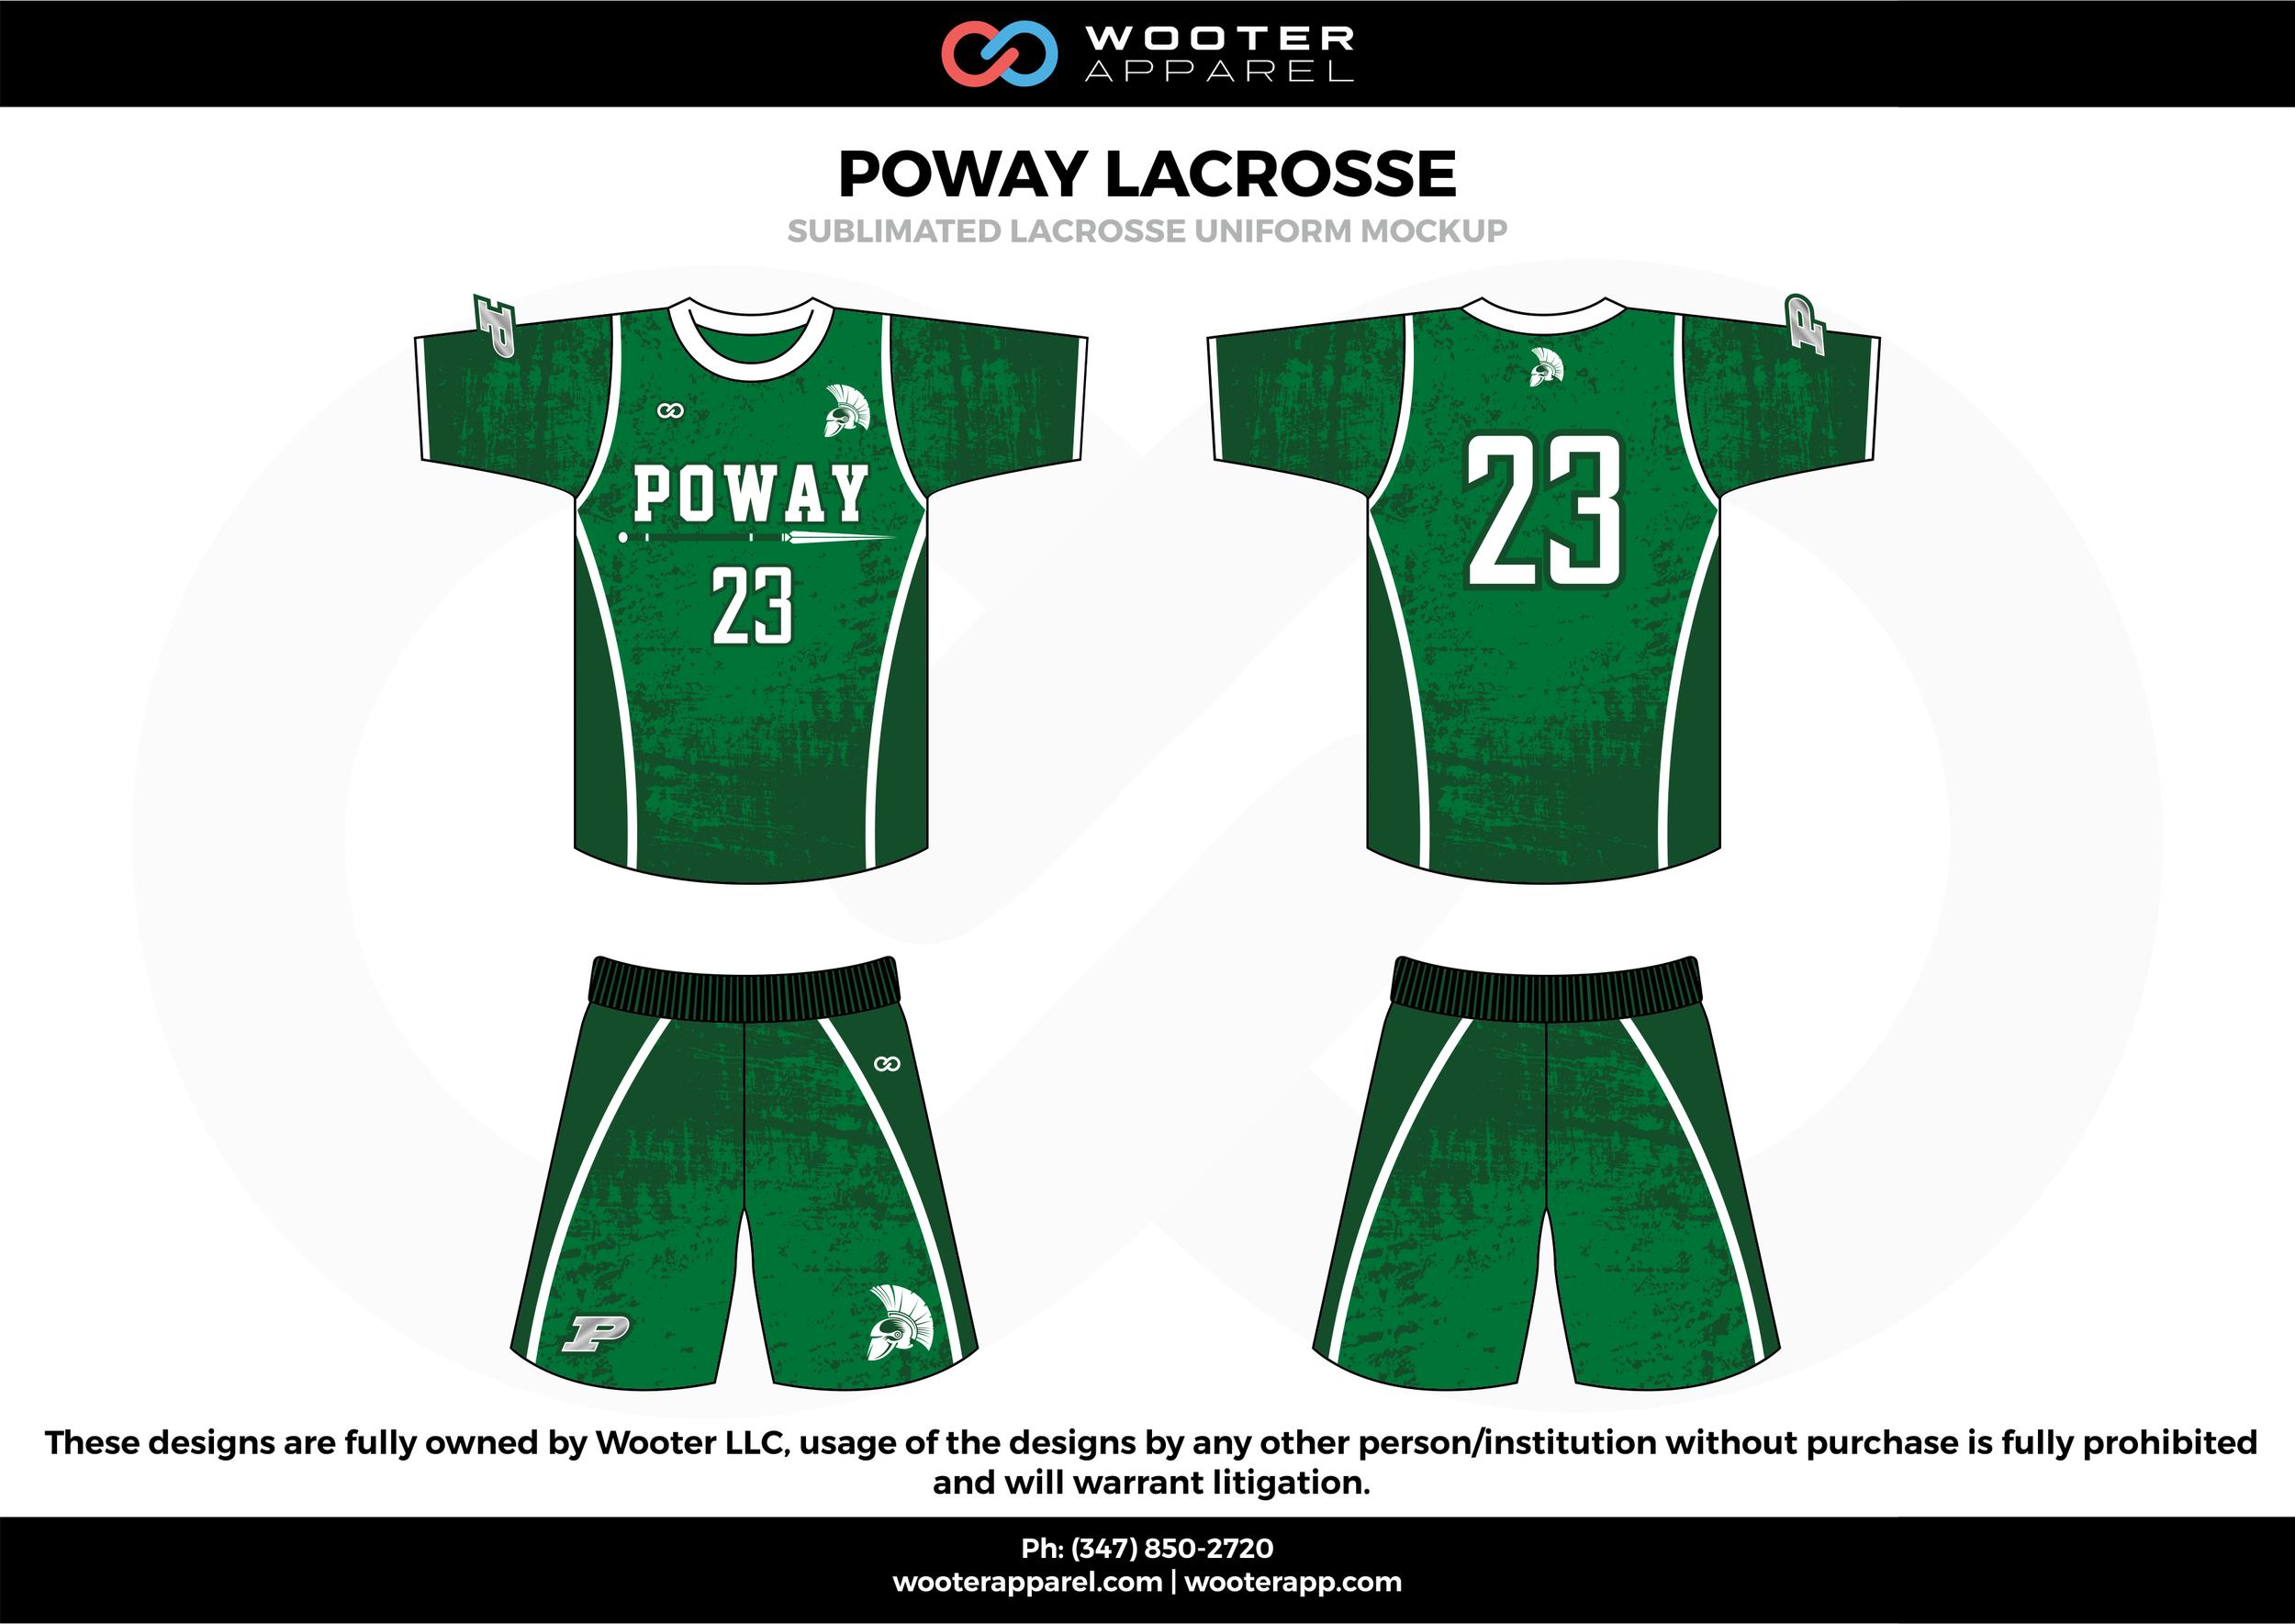 POWAY LACROSSE green white and black Lacrosse uniforms jerseys shirts shorts